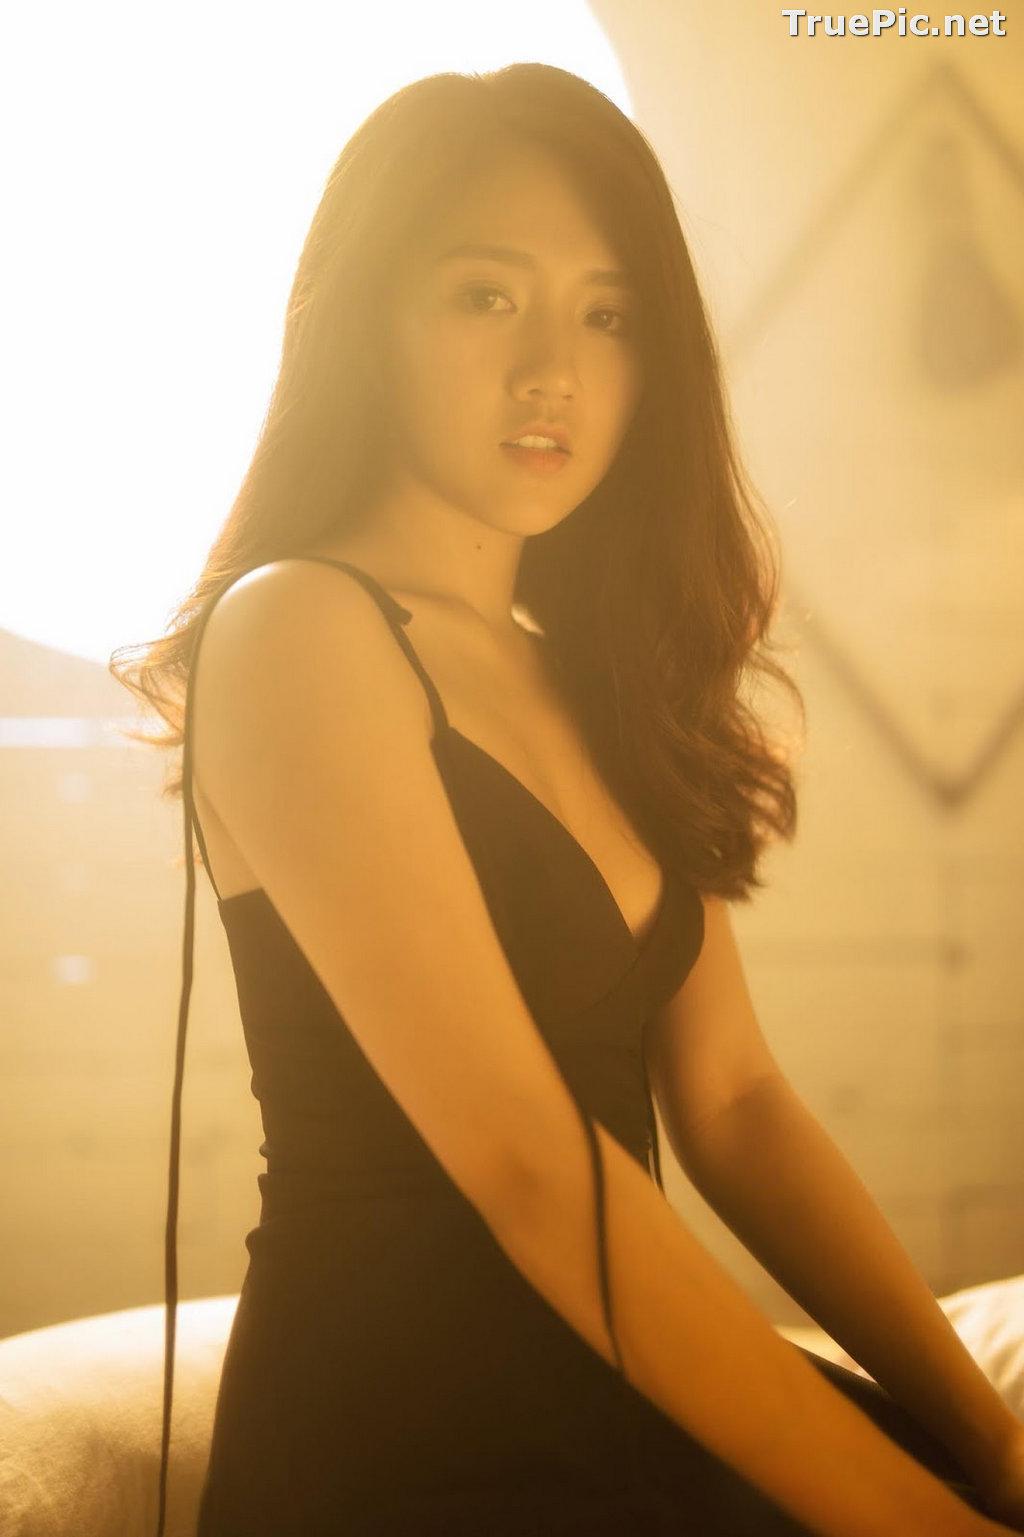 Image Vietnamese Hot Girl - Nguyen Hoang Kieu Trinh - My Black Angel - TruePic.net - Picture-39